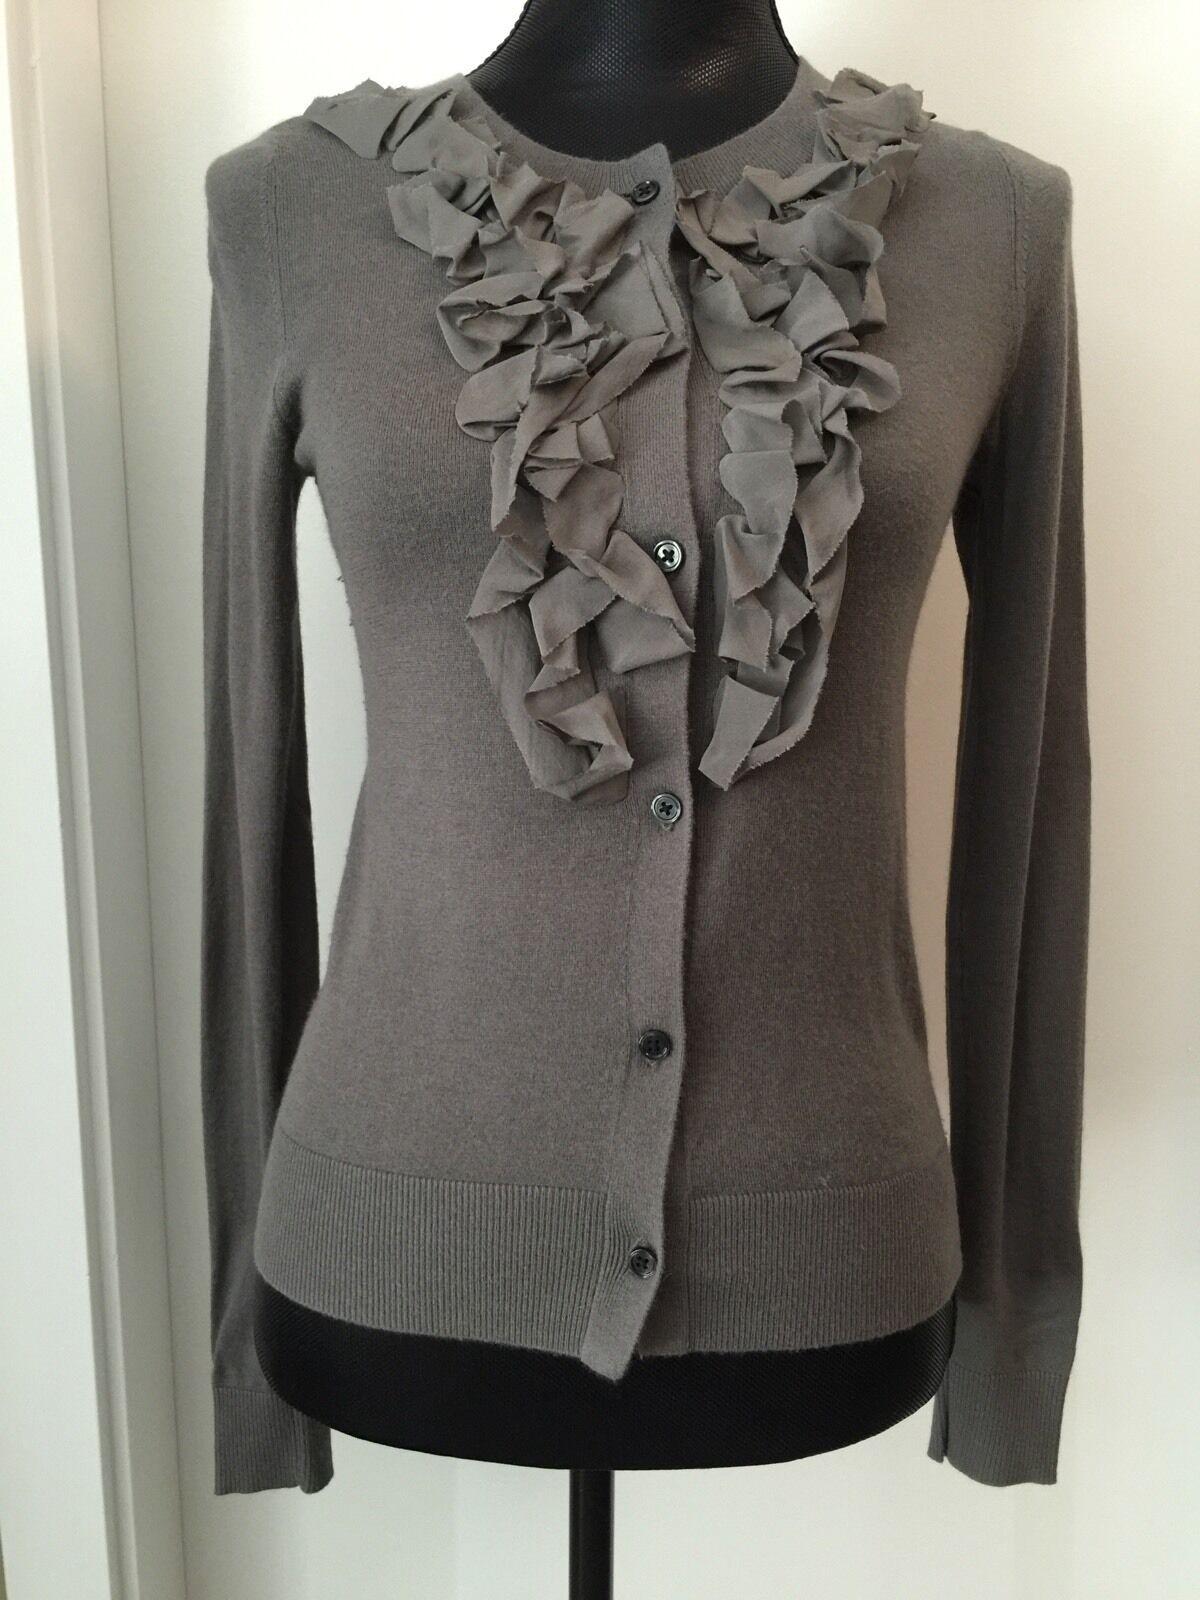 New Club Monaco Long Sleeve Knit Grey Cardigan Sweater XS